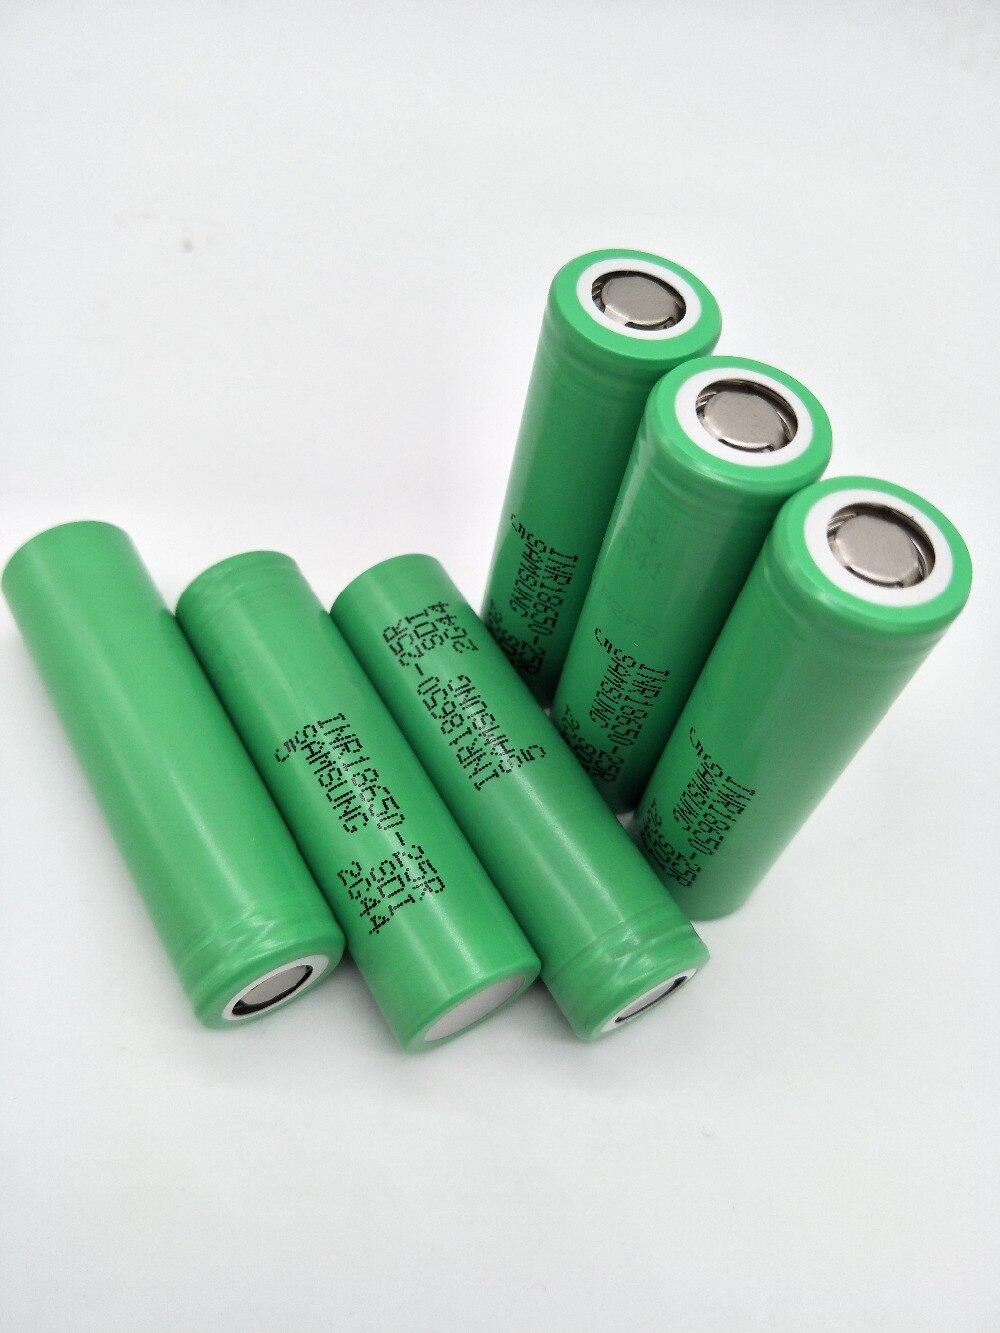 Baterias Recarregáveis de lítio de descarga 20a Tipo : Li-ion